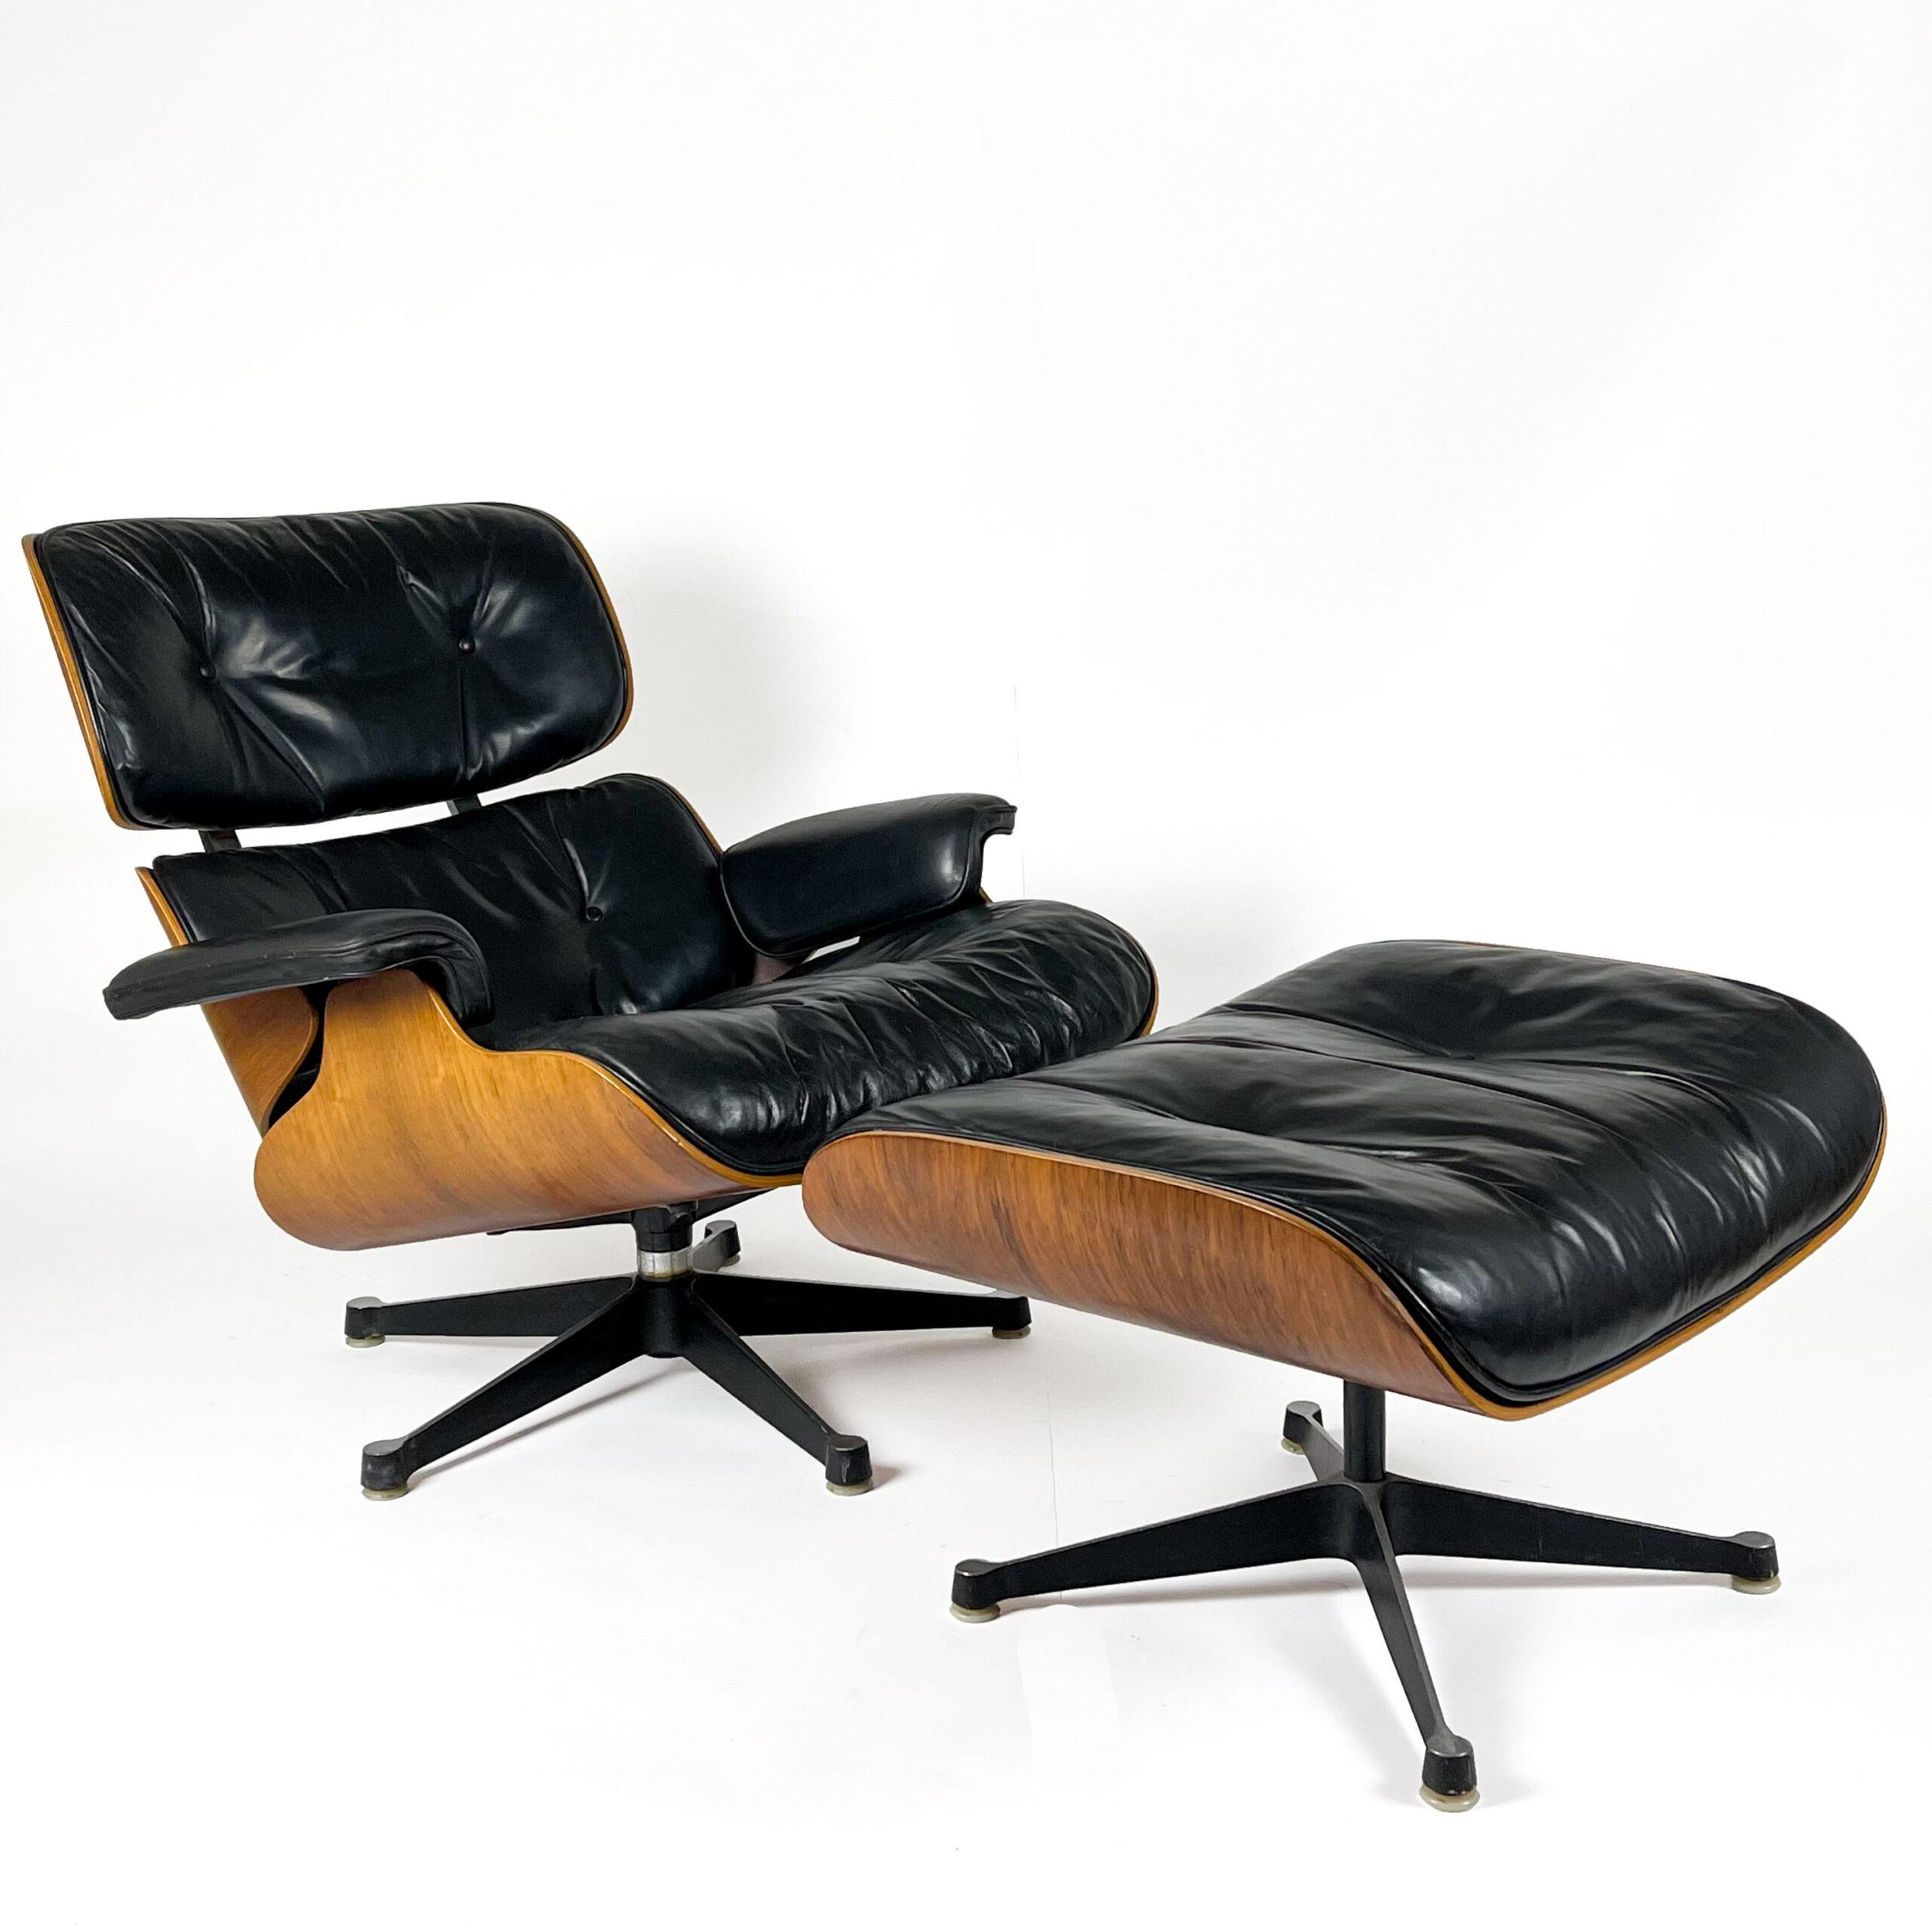 Eames Lounge Ottoman web-1130